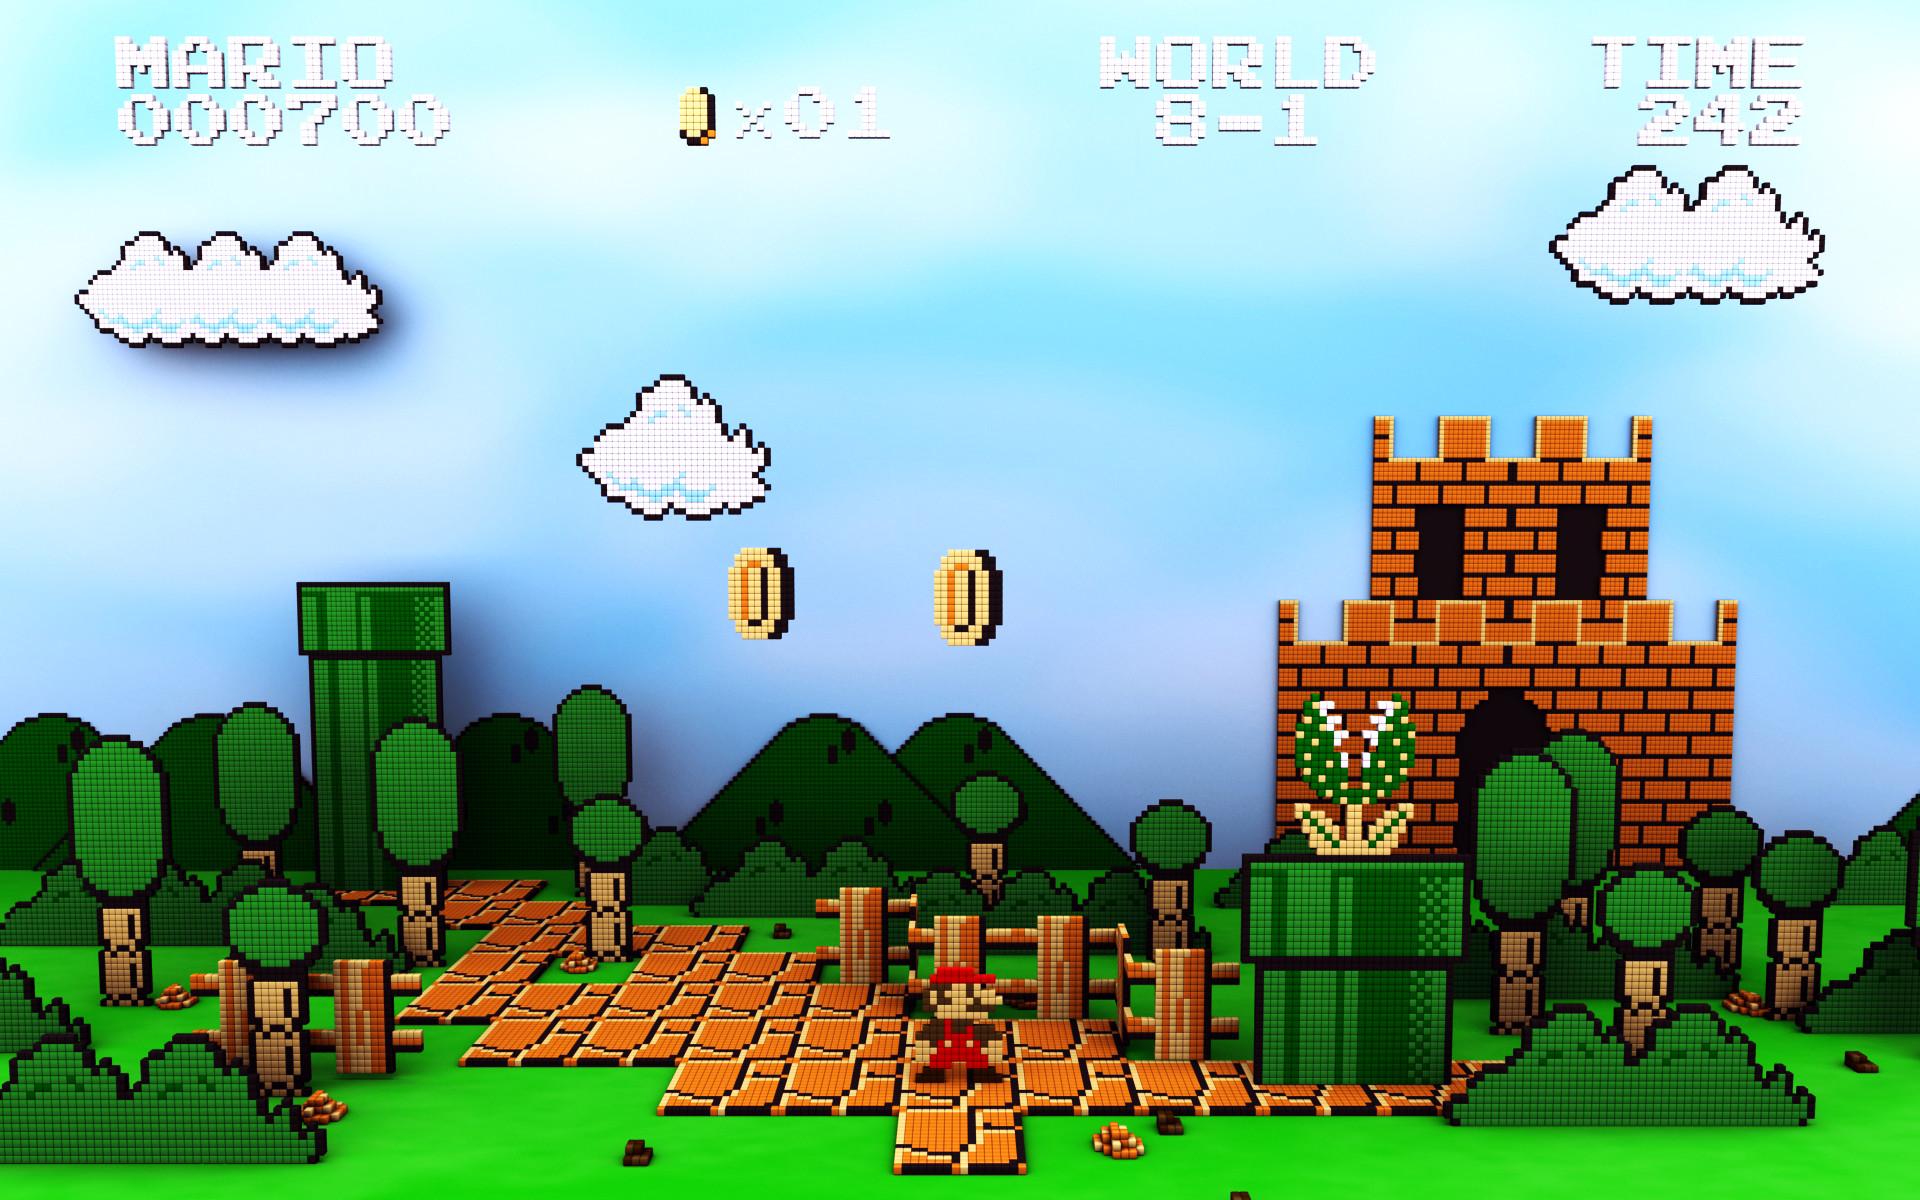 Super Mario Bros HD Wallpapers Free Download.